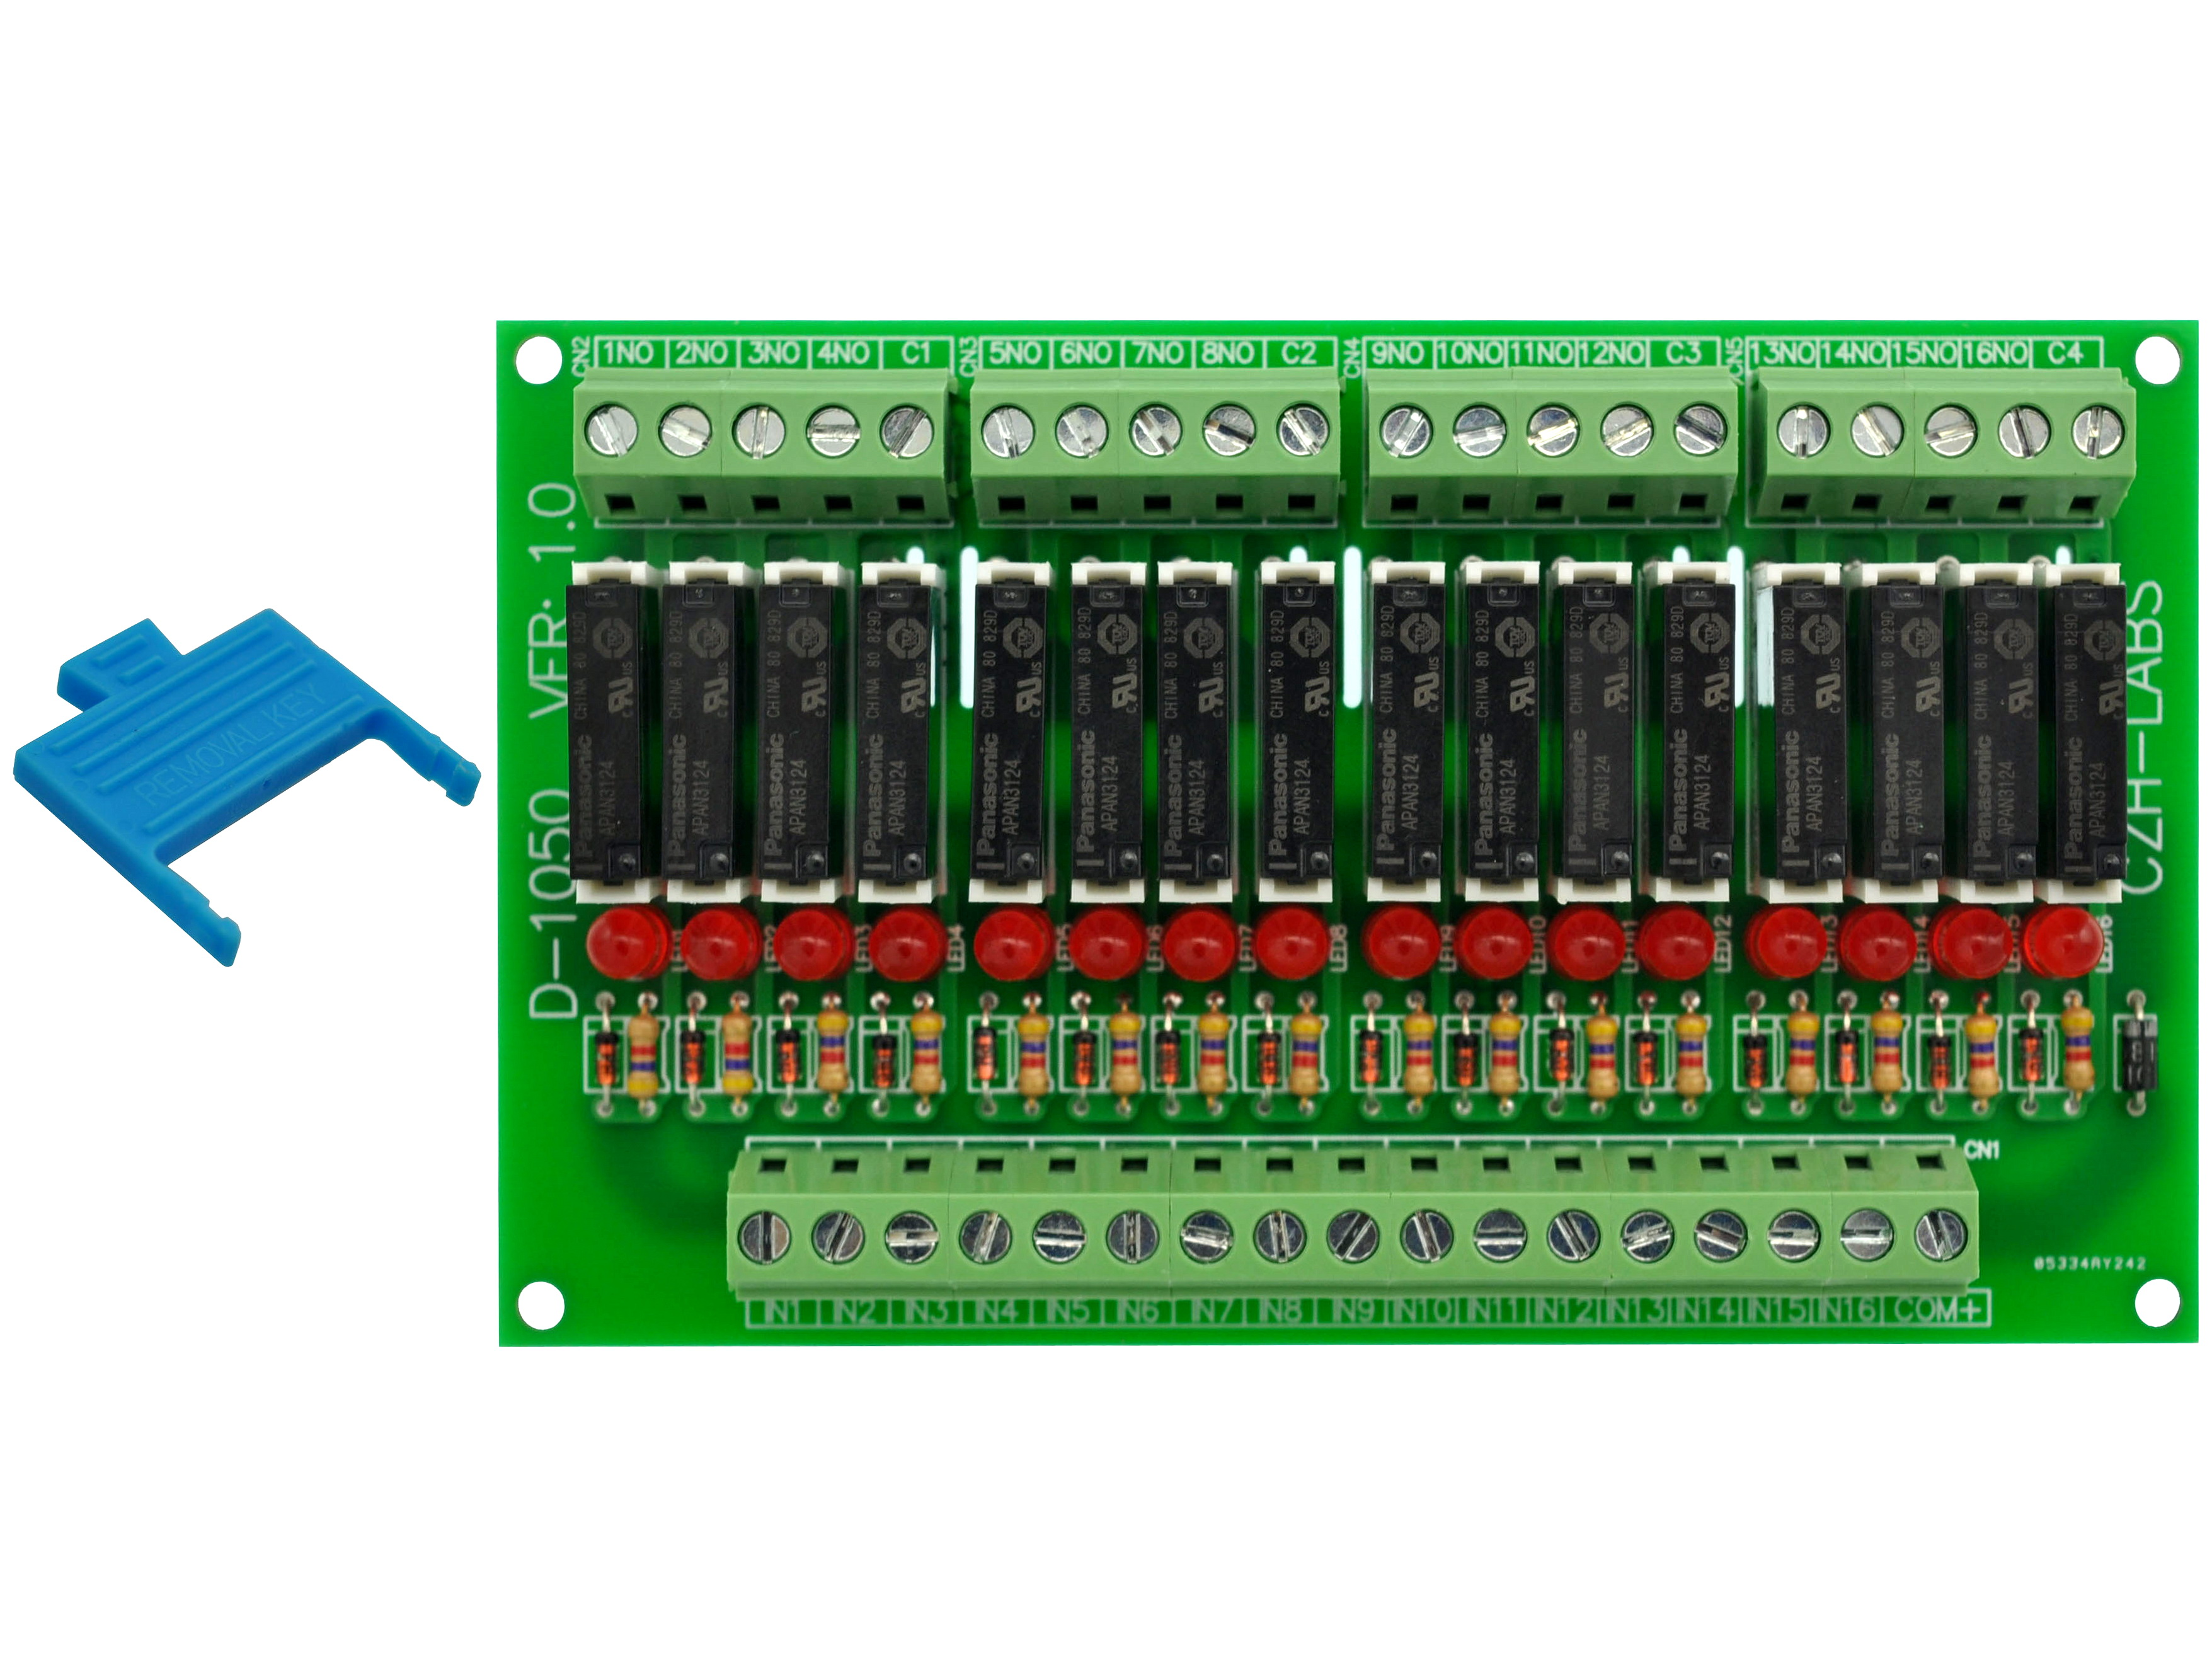 Slim Panel Mount DC24V Sink/NPN 16 SPST-NO 5A Power Relay Module, APAN3124